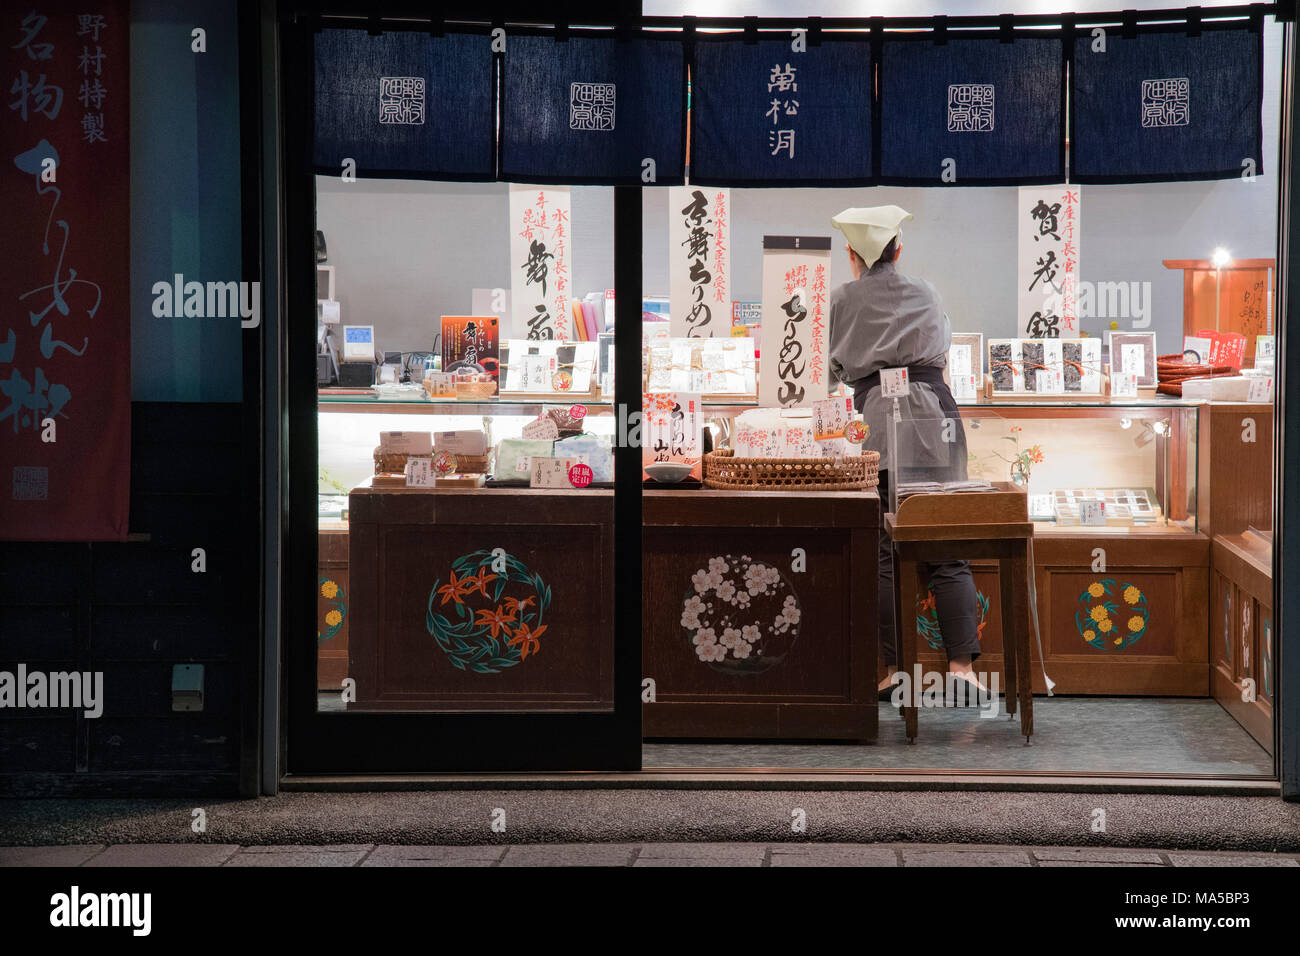 Asien, Japan, Nihon, Nippon, Kyoto, Japan Confiserie Stockbild